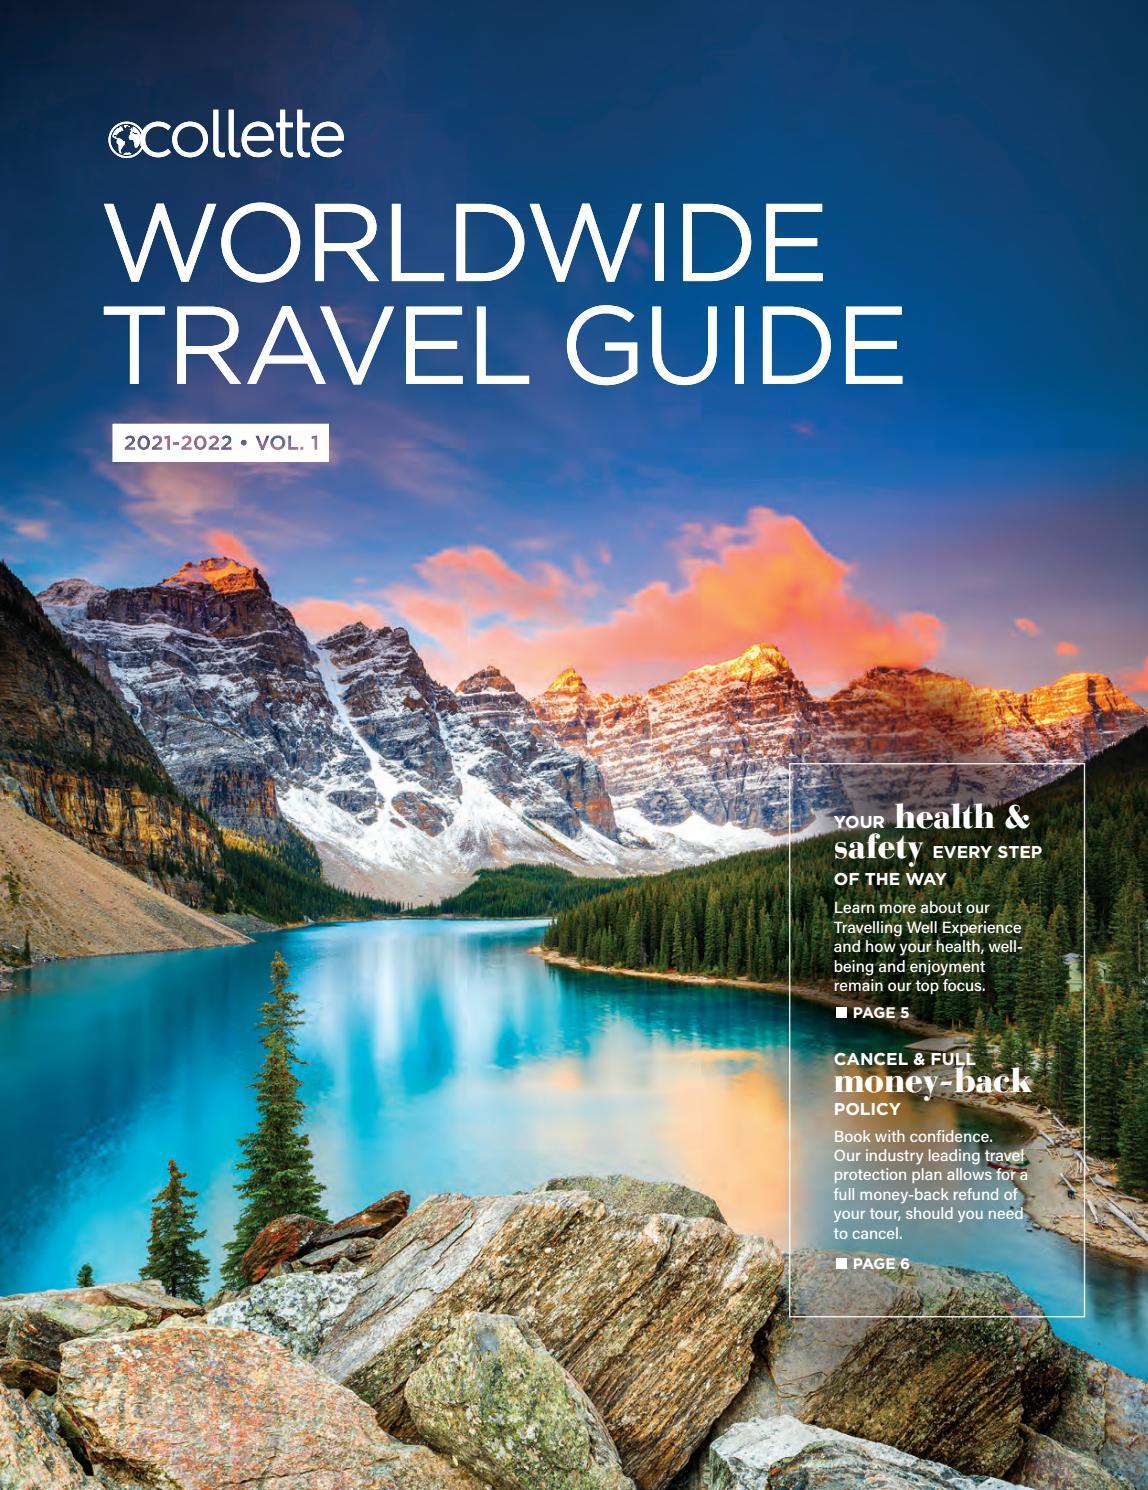 Republic Services Las Vegas Bulk Pickup Calendar 2022.2021 2022 Worldwide Brochure Cad By Collette Issuu